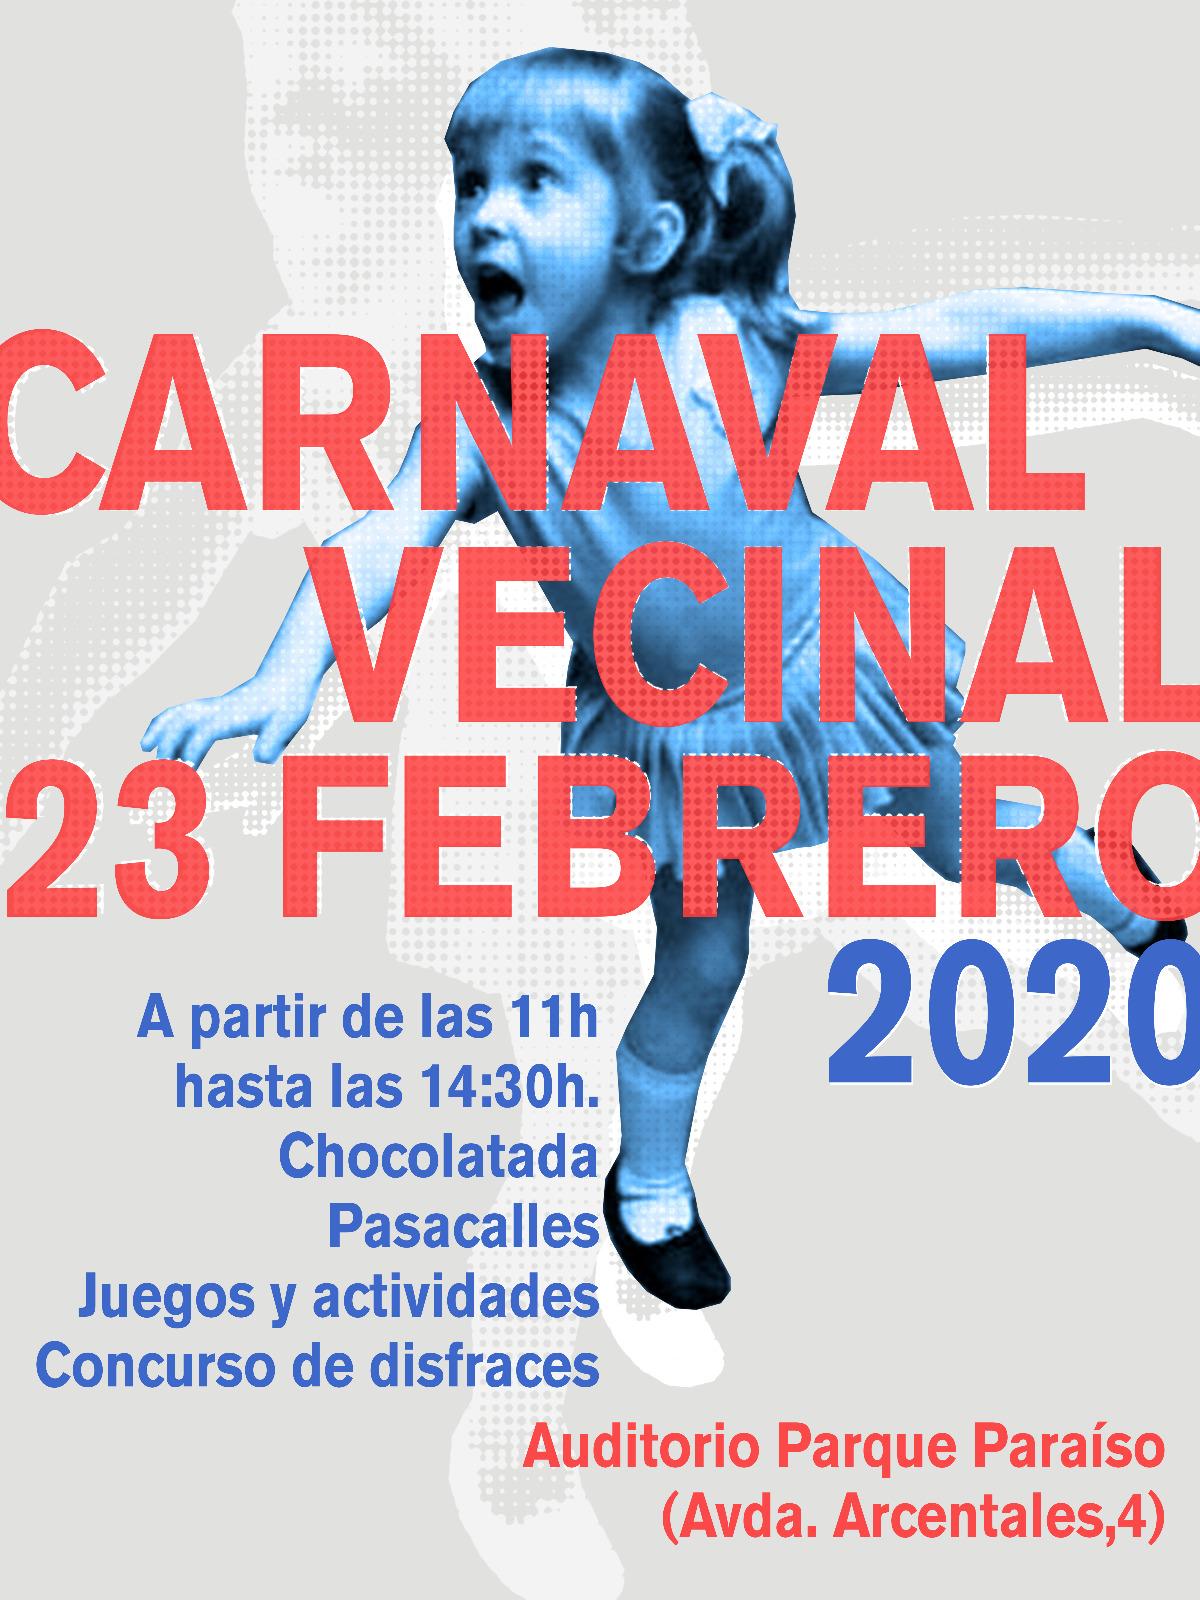 Carnaval Vecinal 2020